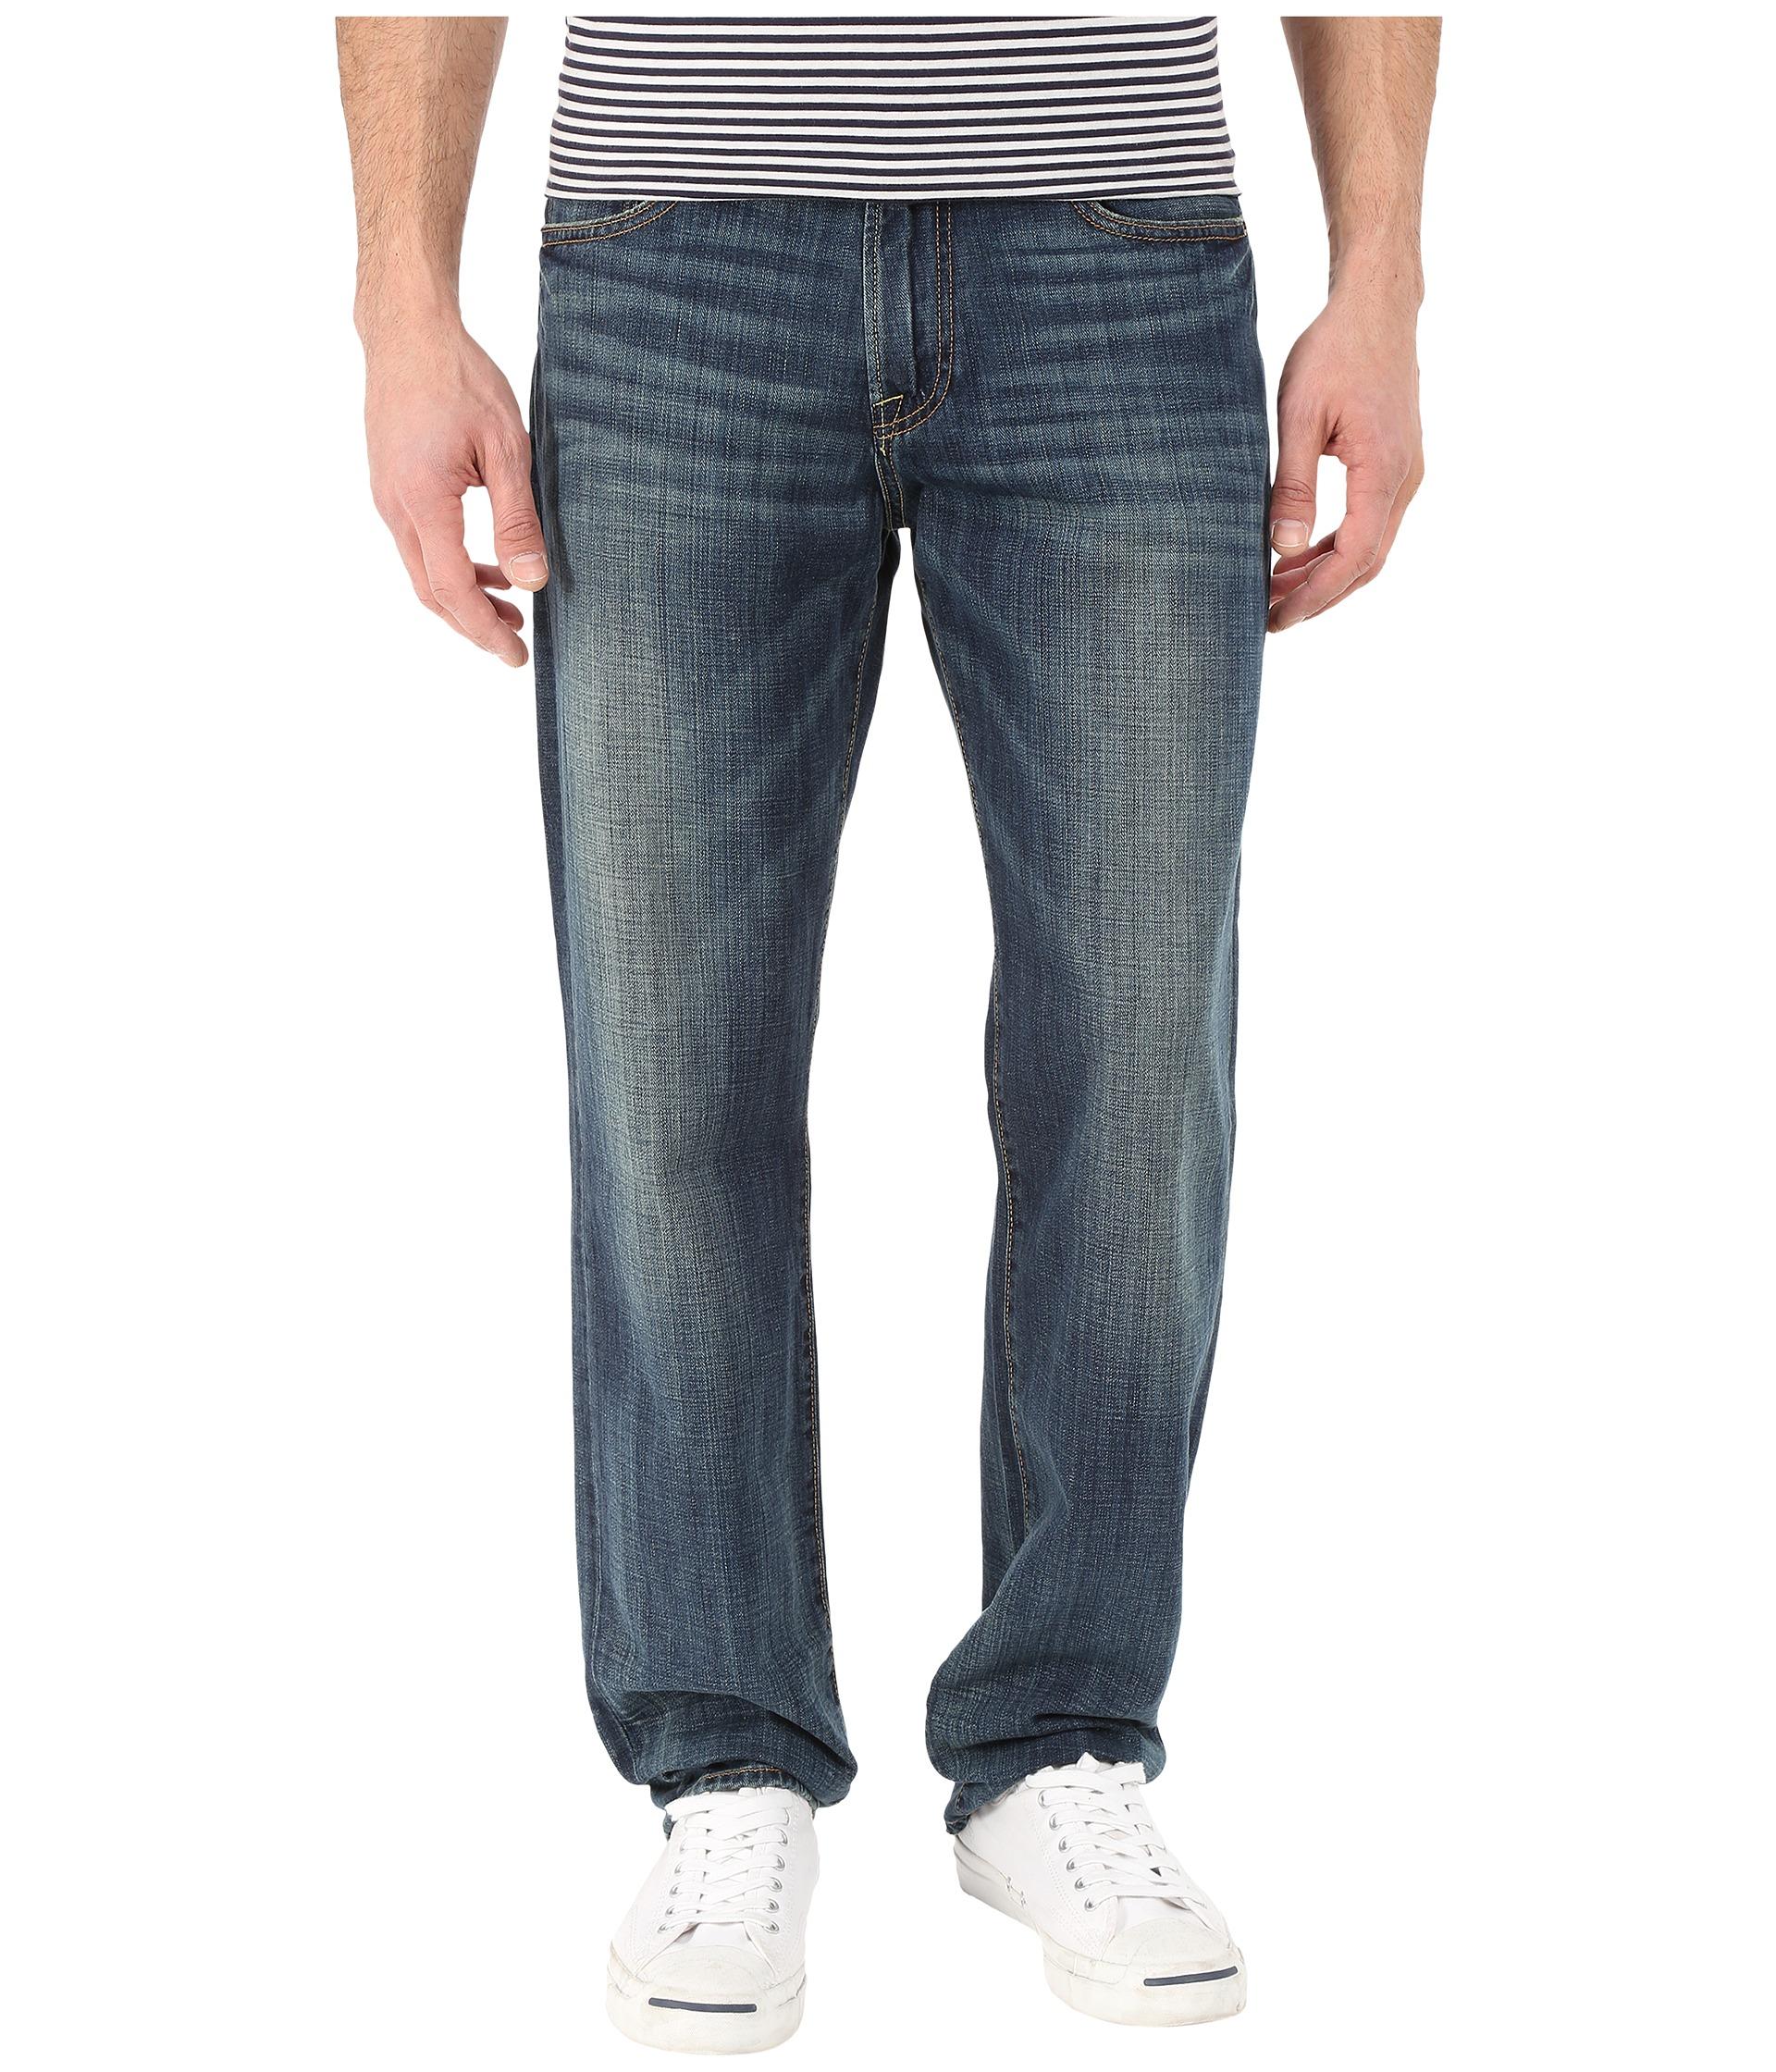 Lucky Brand 221 Original Straight Jeans in OL Wilder Ranch Ol Wilder Ranch